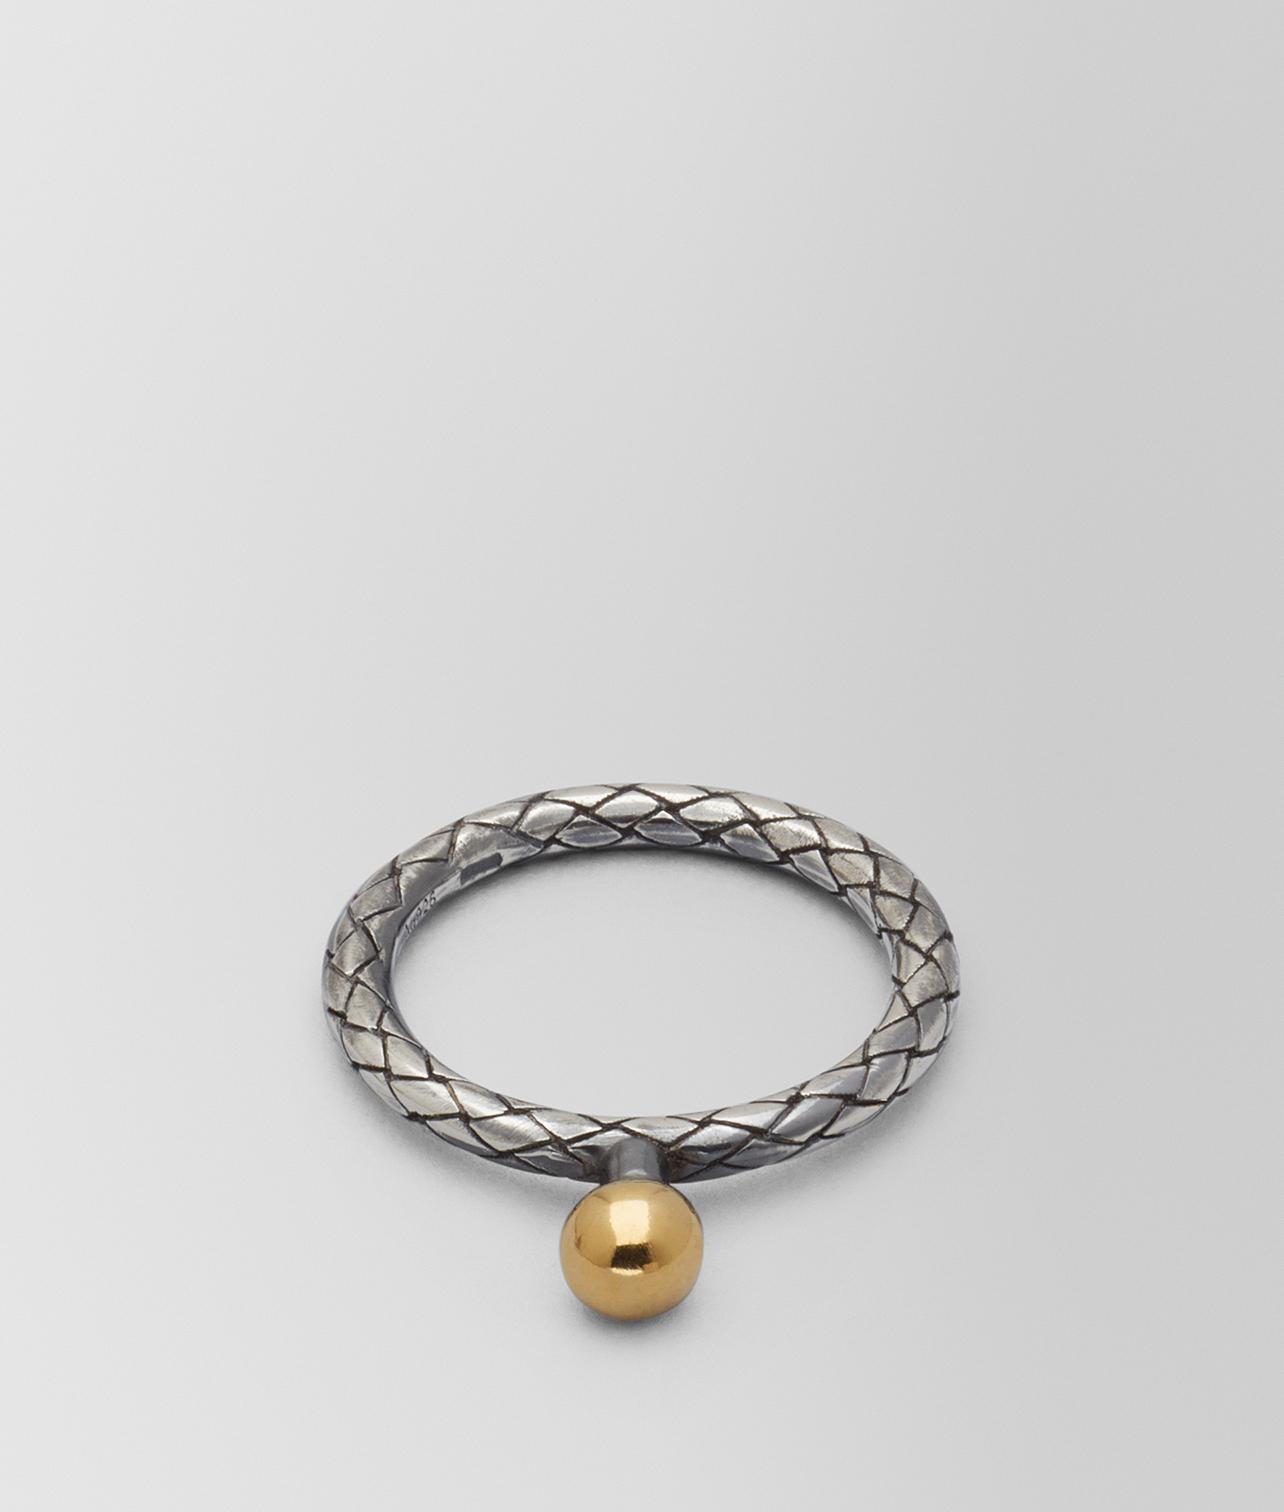 Bottega Veneta Antique Silver/Yellow Gold Patina Dichotomy Necklace Argento antique GkbwyJm